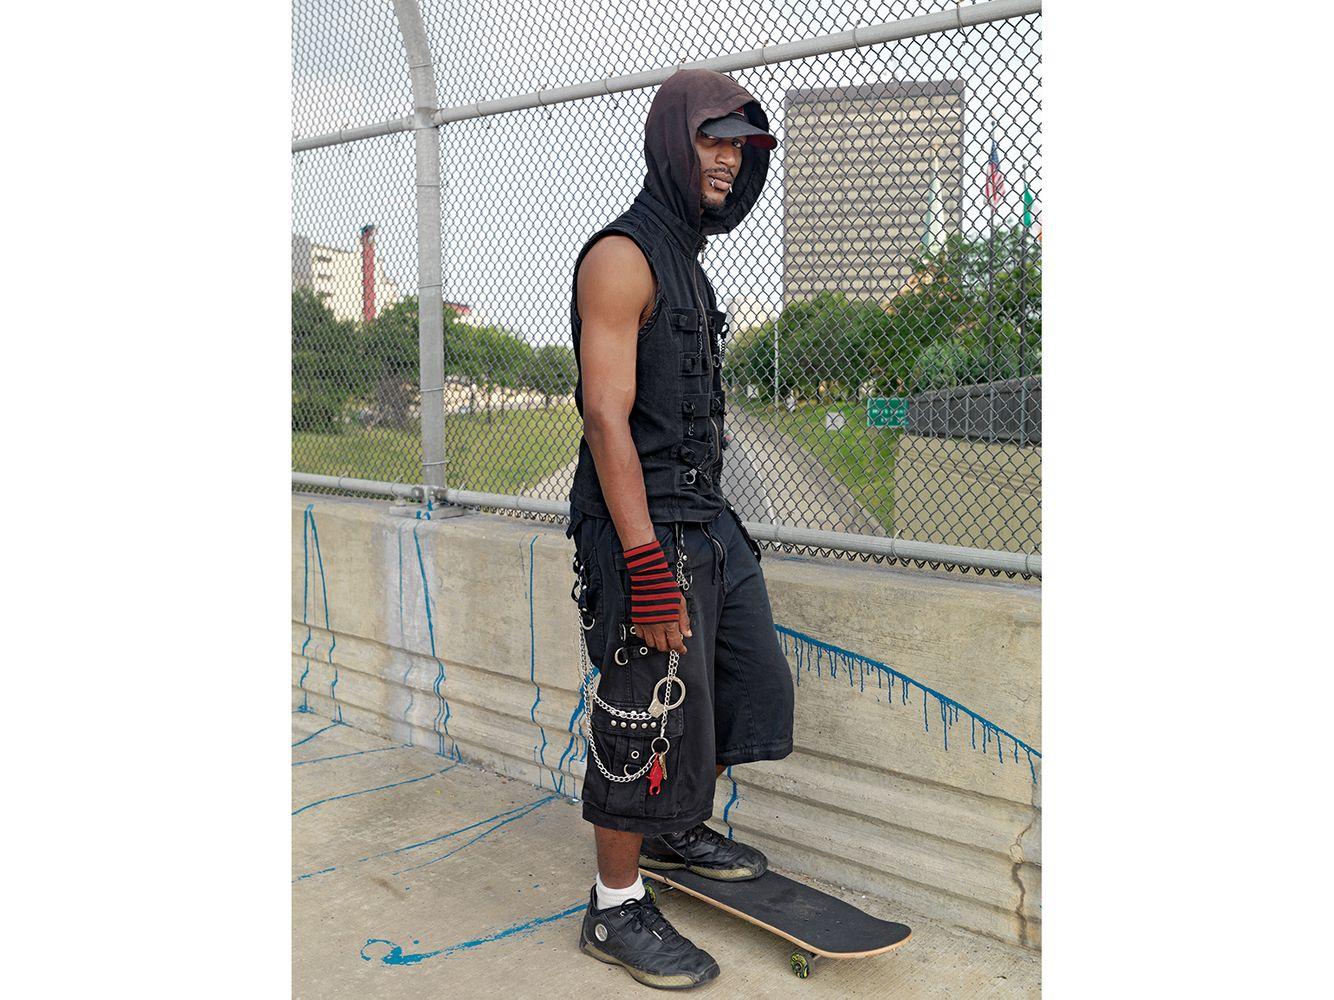 Jai, HERO cropped, Detroit 2010_3152.jpg